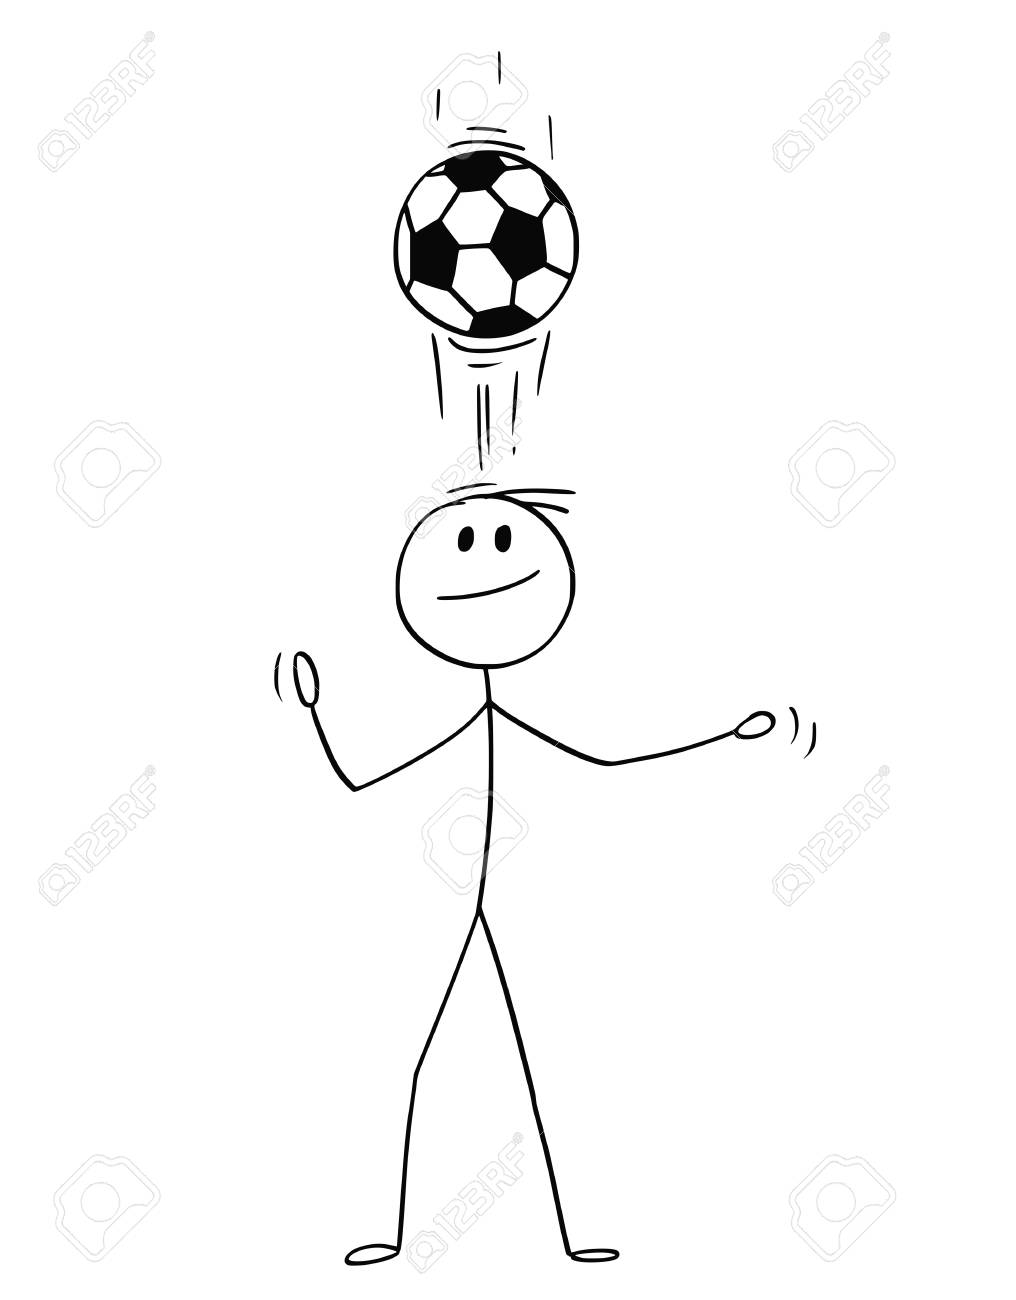 Cartoon Stick Man Drawing Conceptual Illustration Of Football